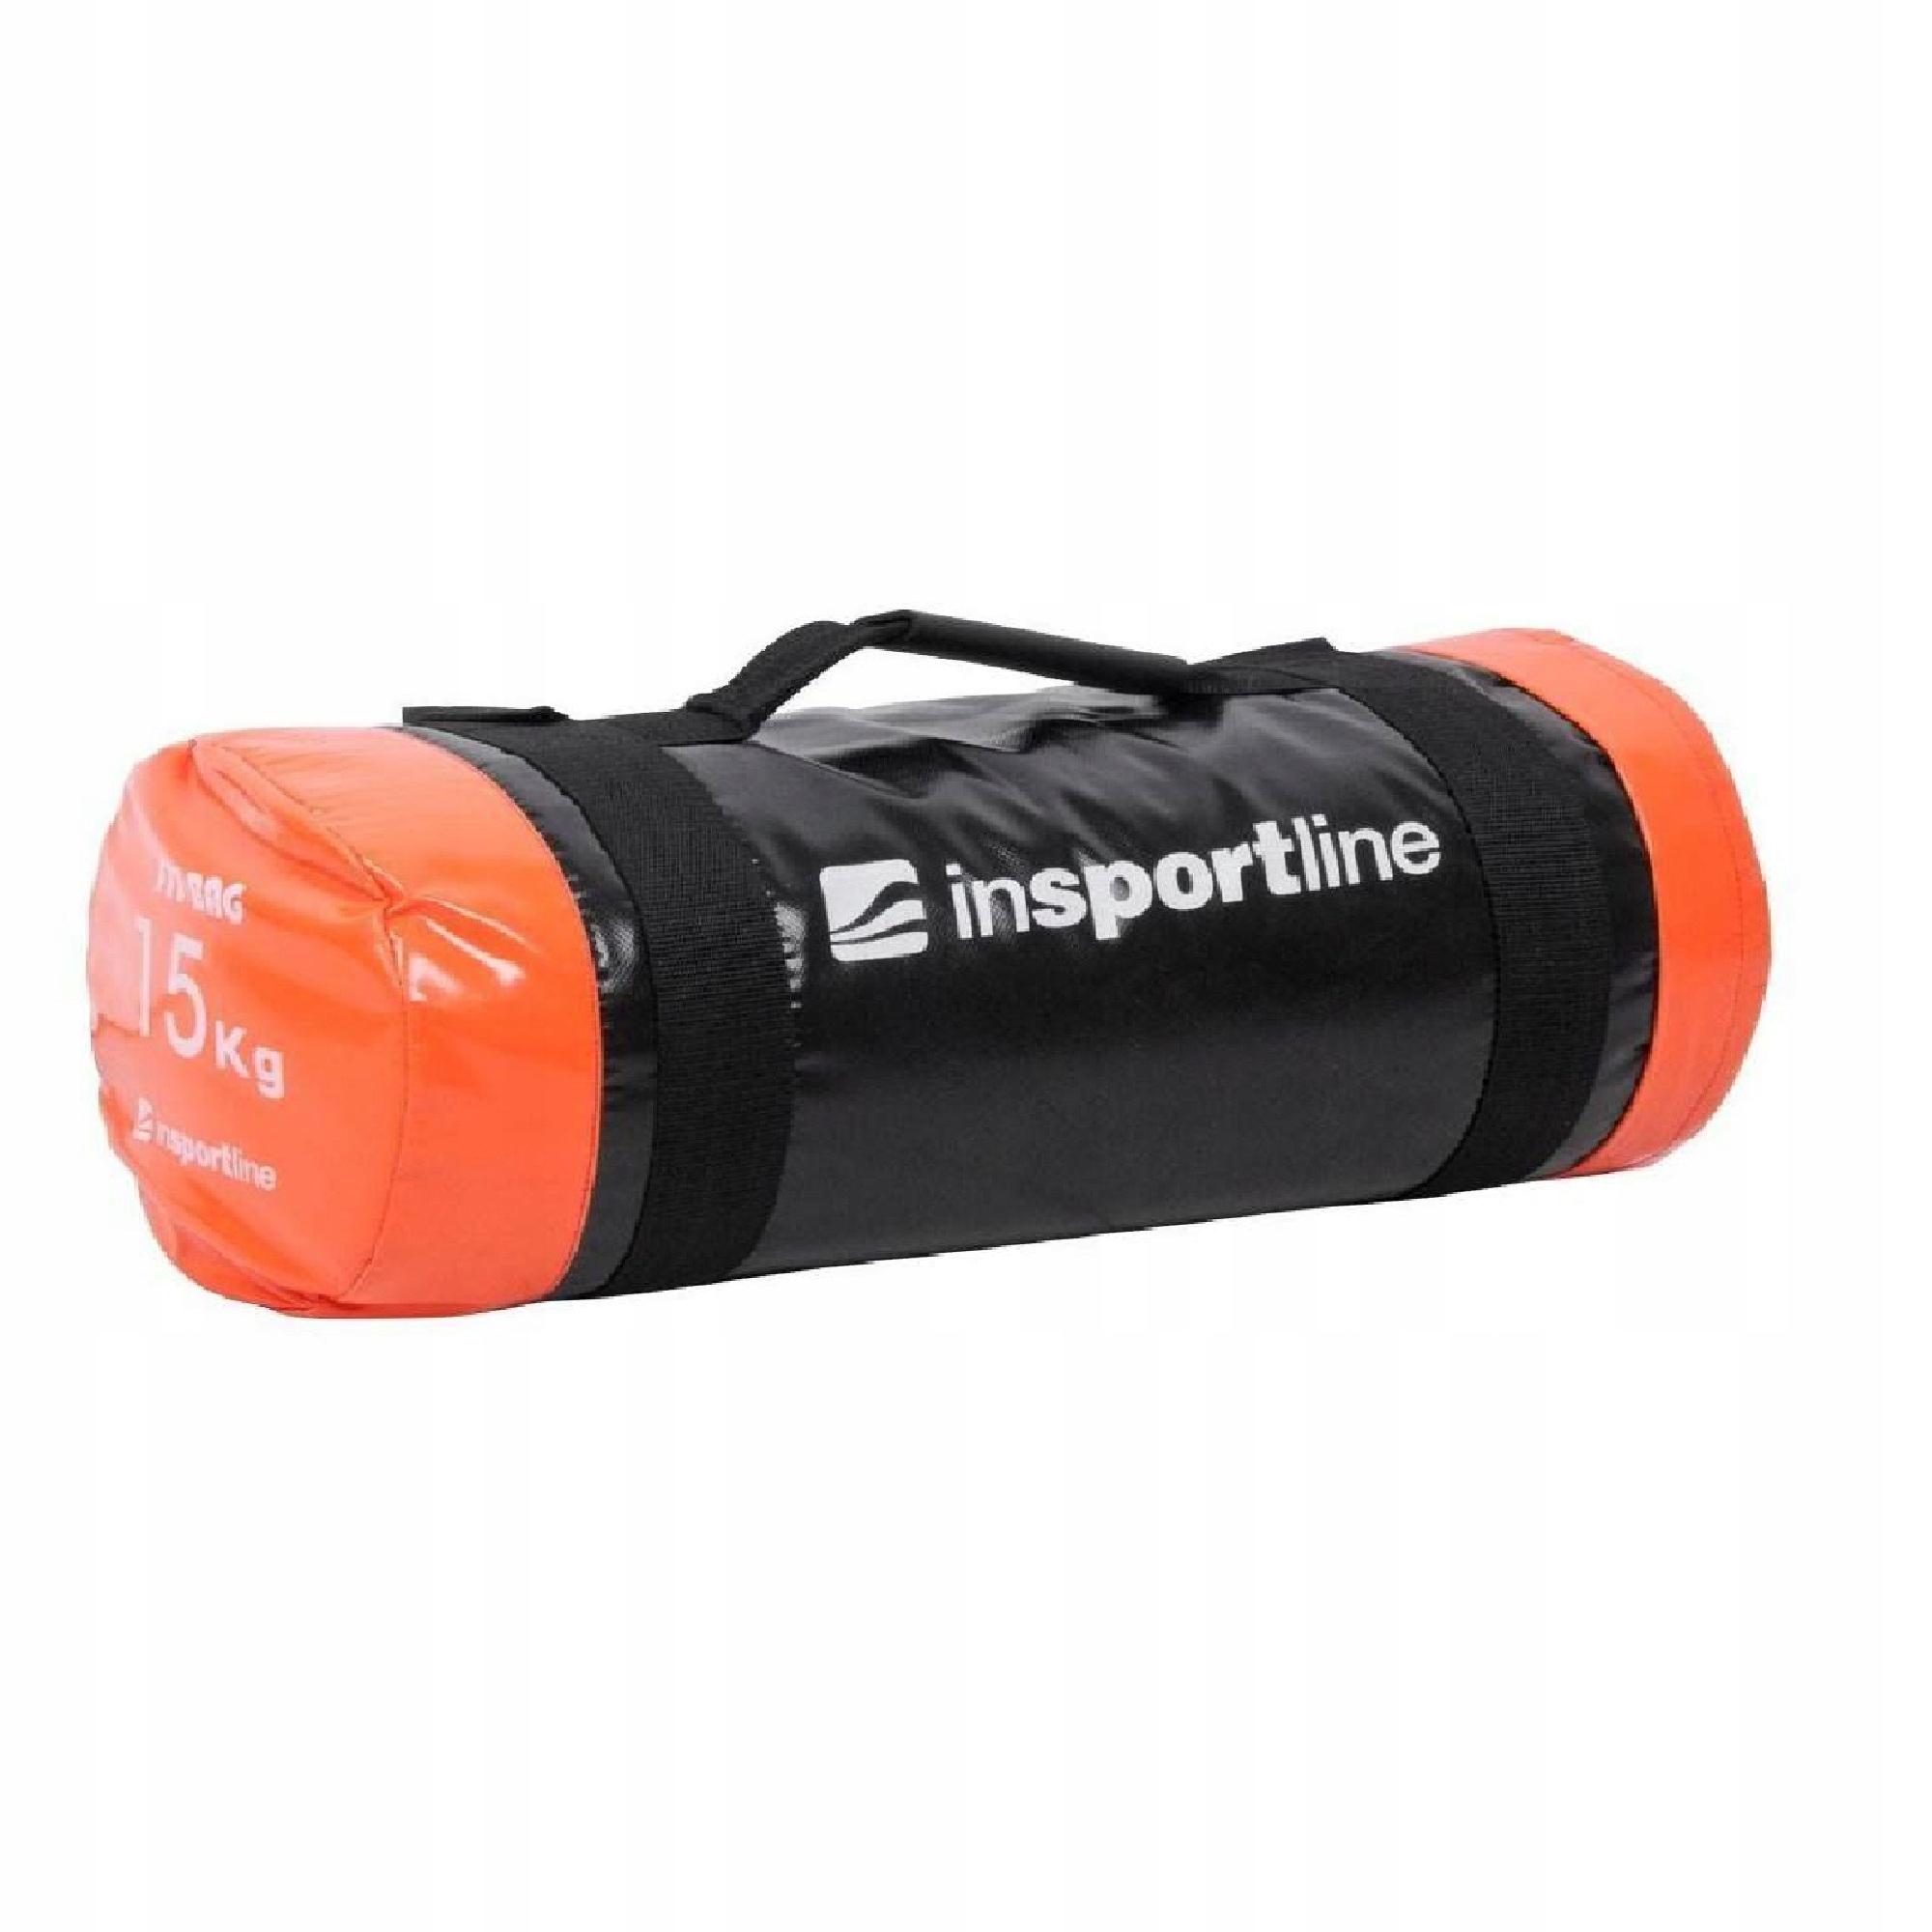 Worek Treningowy Fitness 15 Kg Insportline FitBag